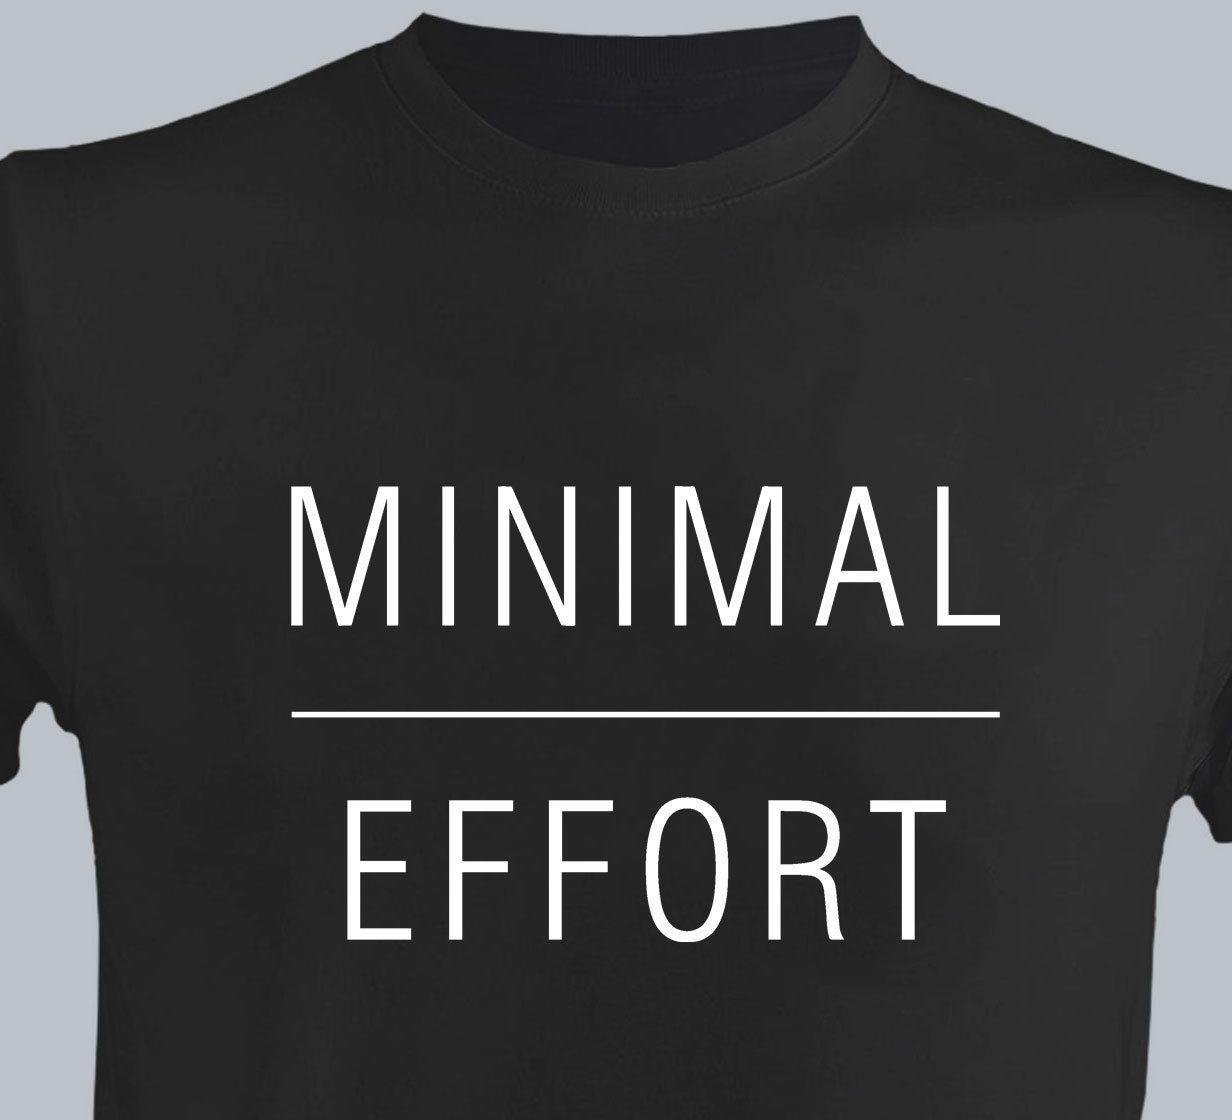 photo about Printable Tshirt Vinyl named Minimum Energy Males Clean T-blouse VINYL Print Amusing Slogan Reward for Him Relaxed Lazy white black gray pink pants tshirt